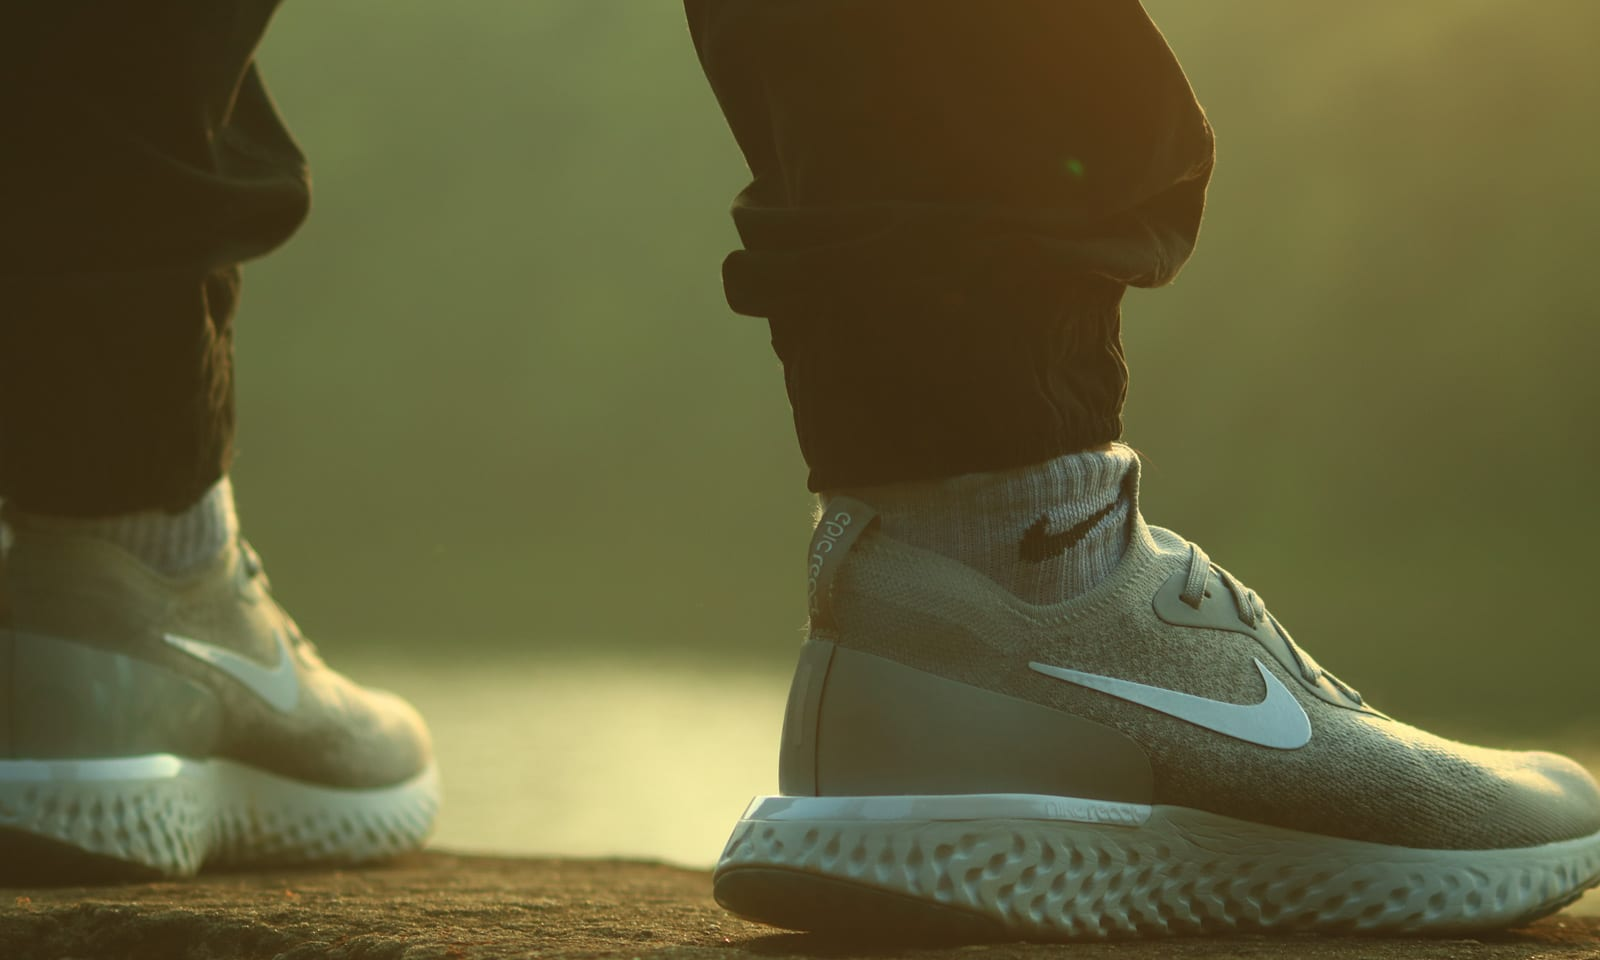 10 ReviewsShoe Nike Best Basketball Shoes2019 Adviser rxCdBoe